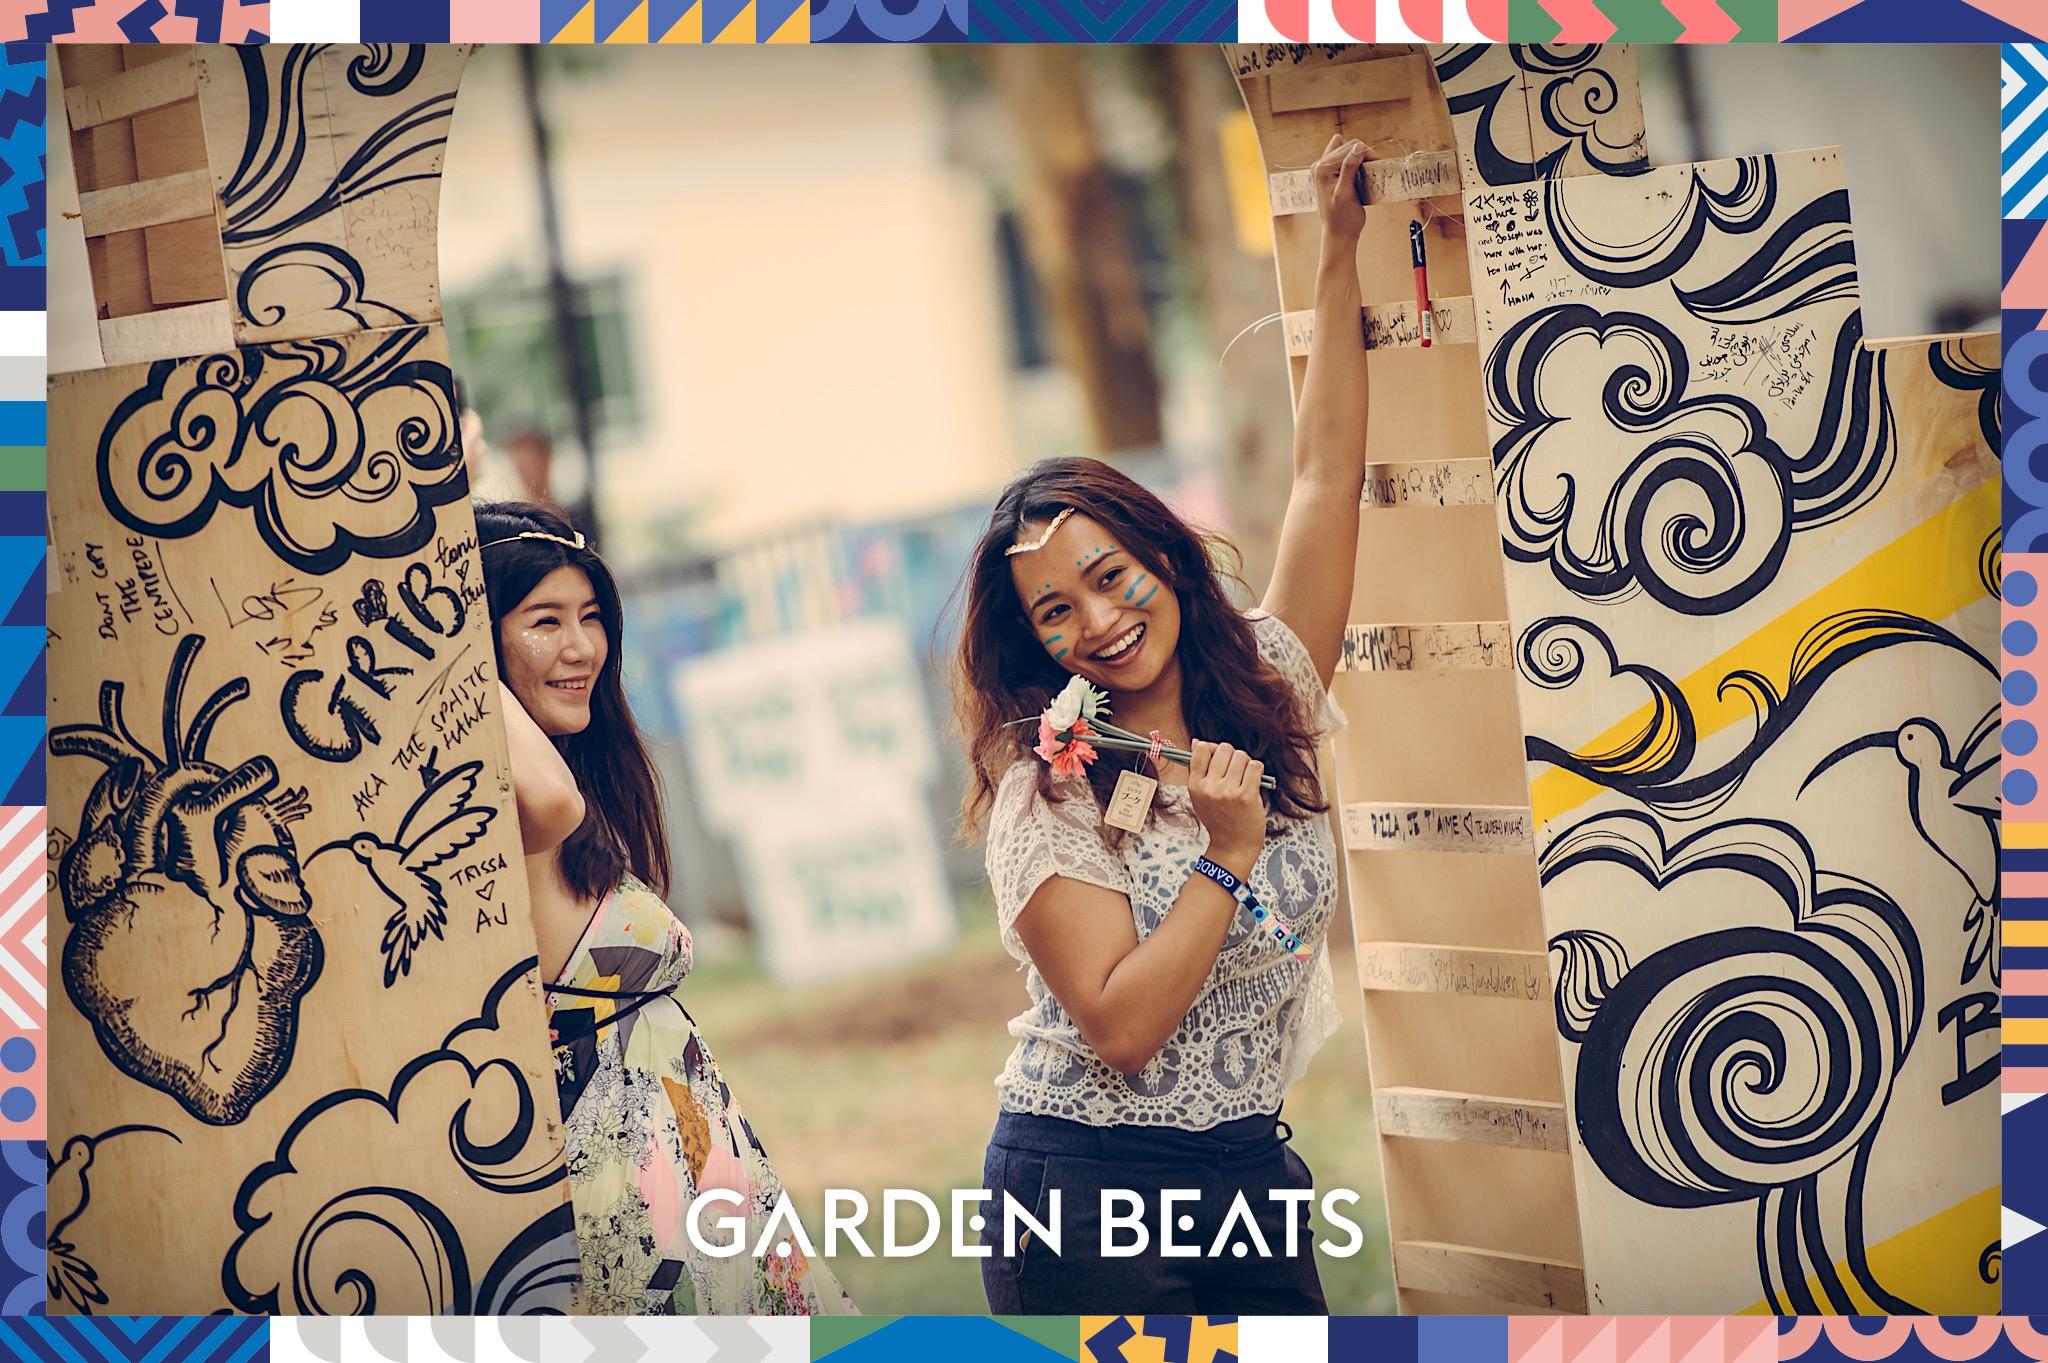 03032018_GardenBeats_Colossal433_Watermarked.jpg